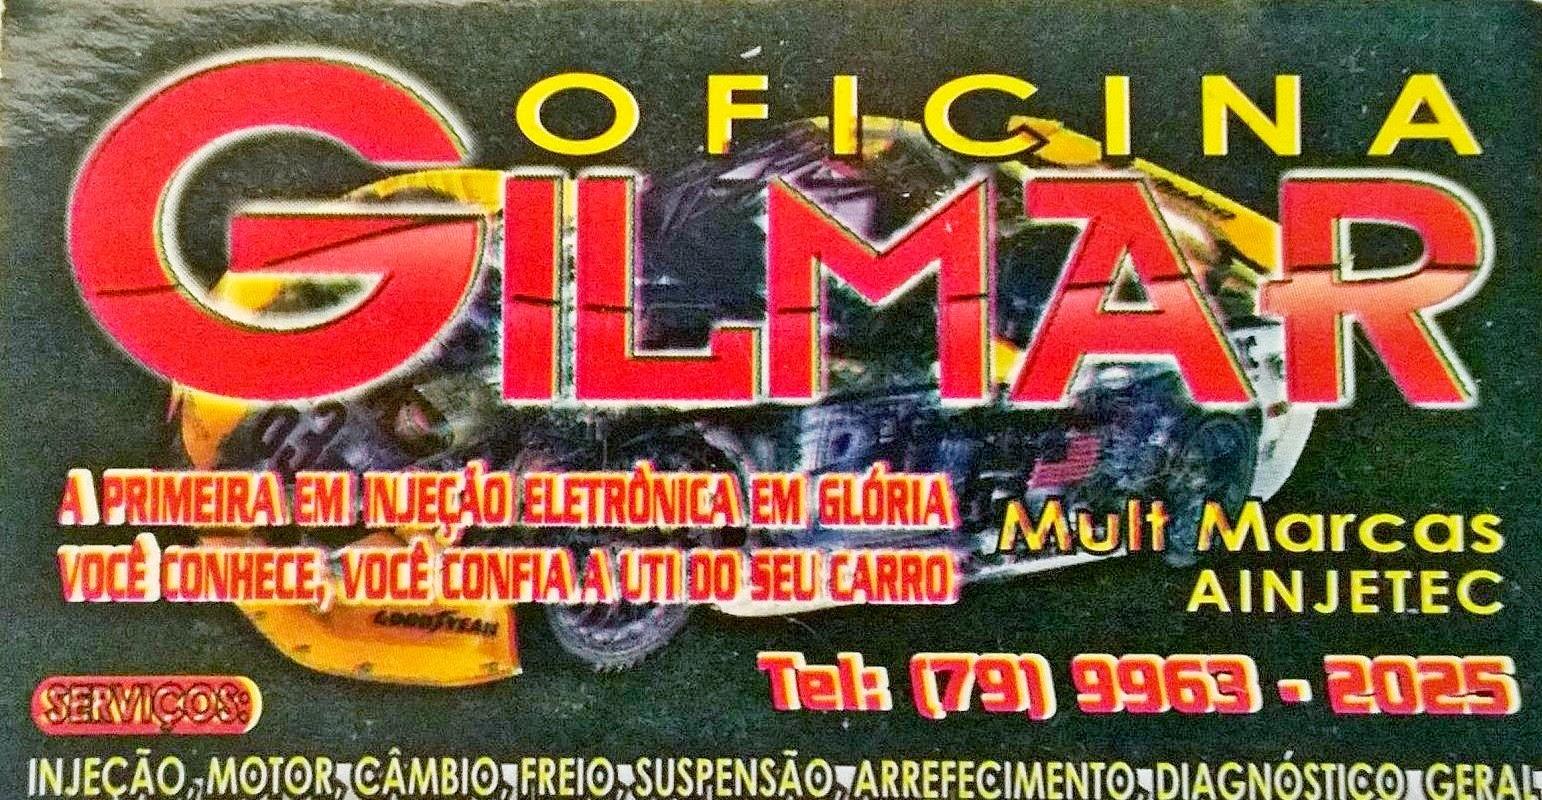 OFICINA GILMAR - GLÓRIA